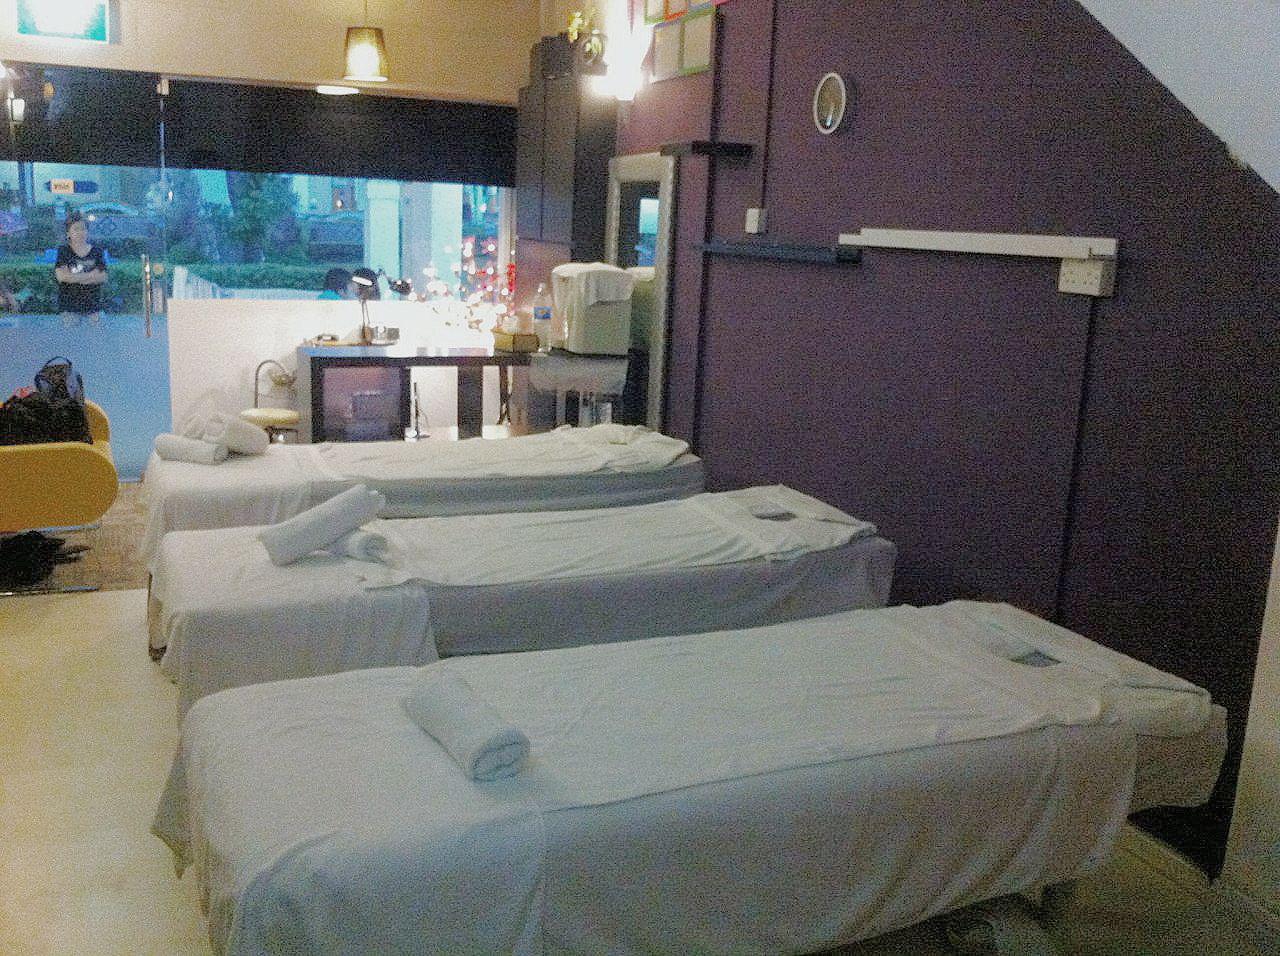 Thai Massage Parlours in Singapore - Thai Massage Singapore